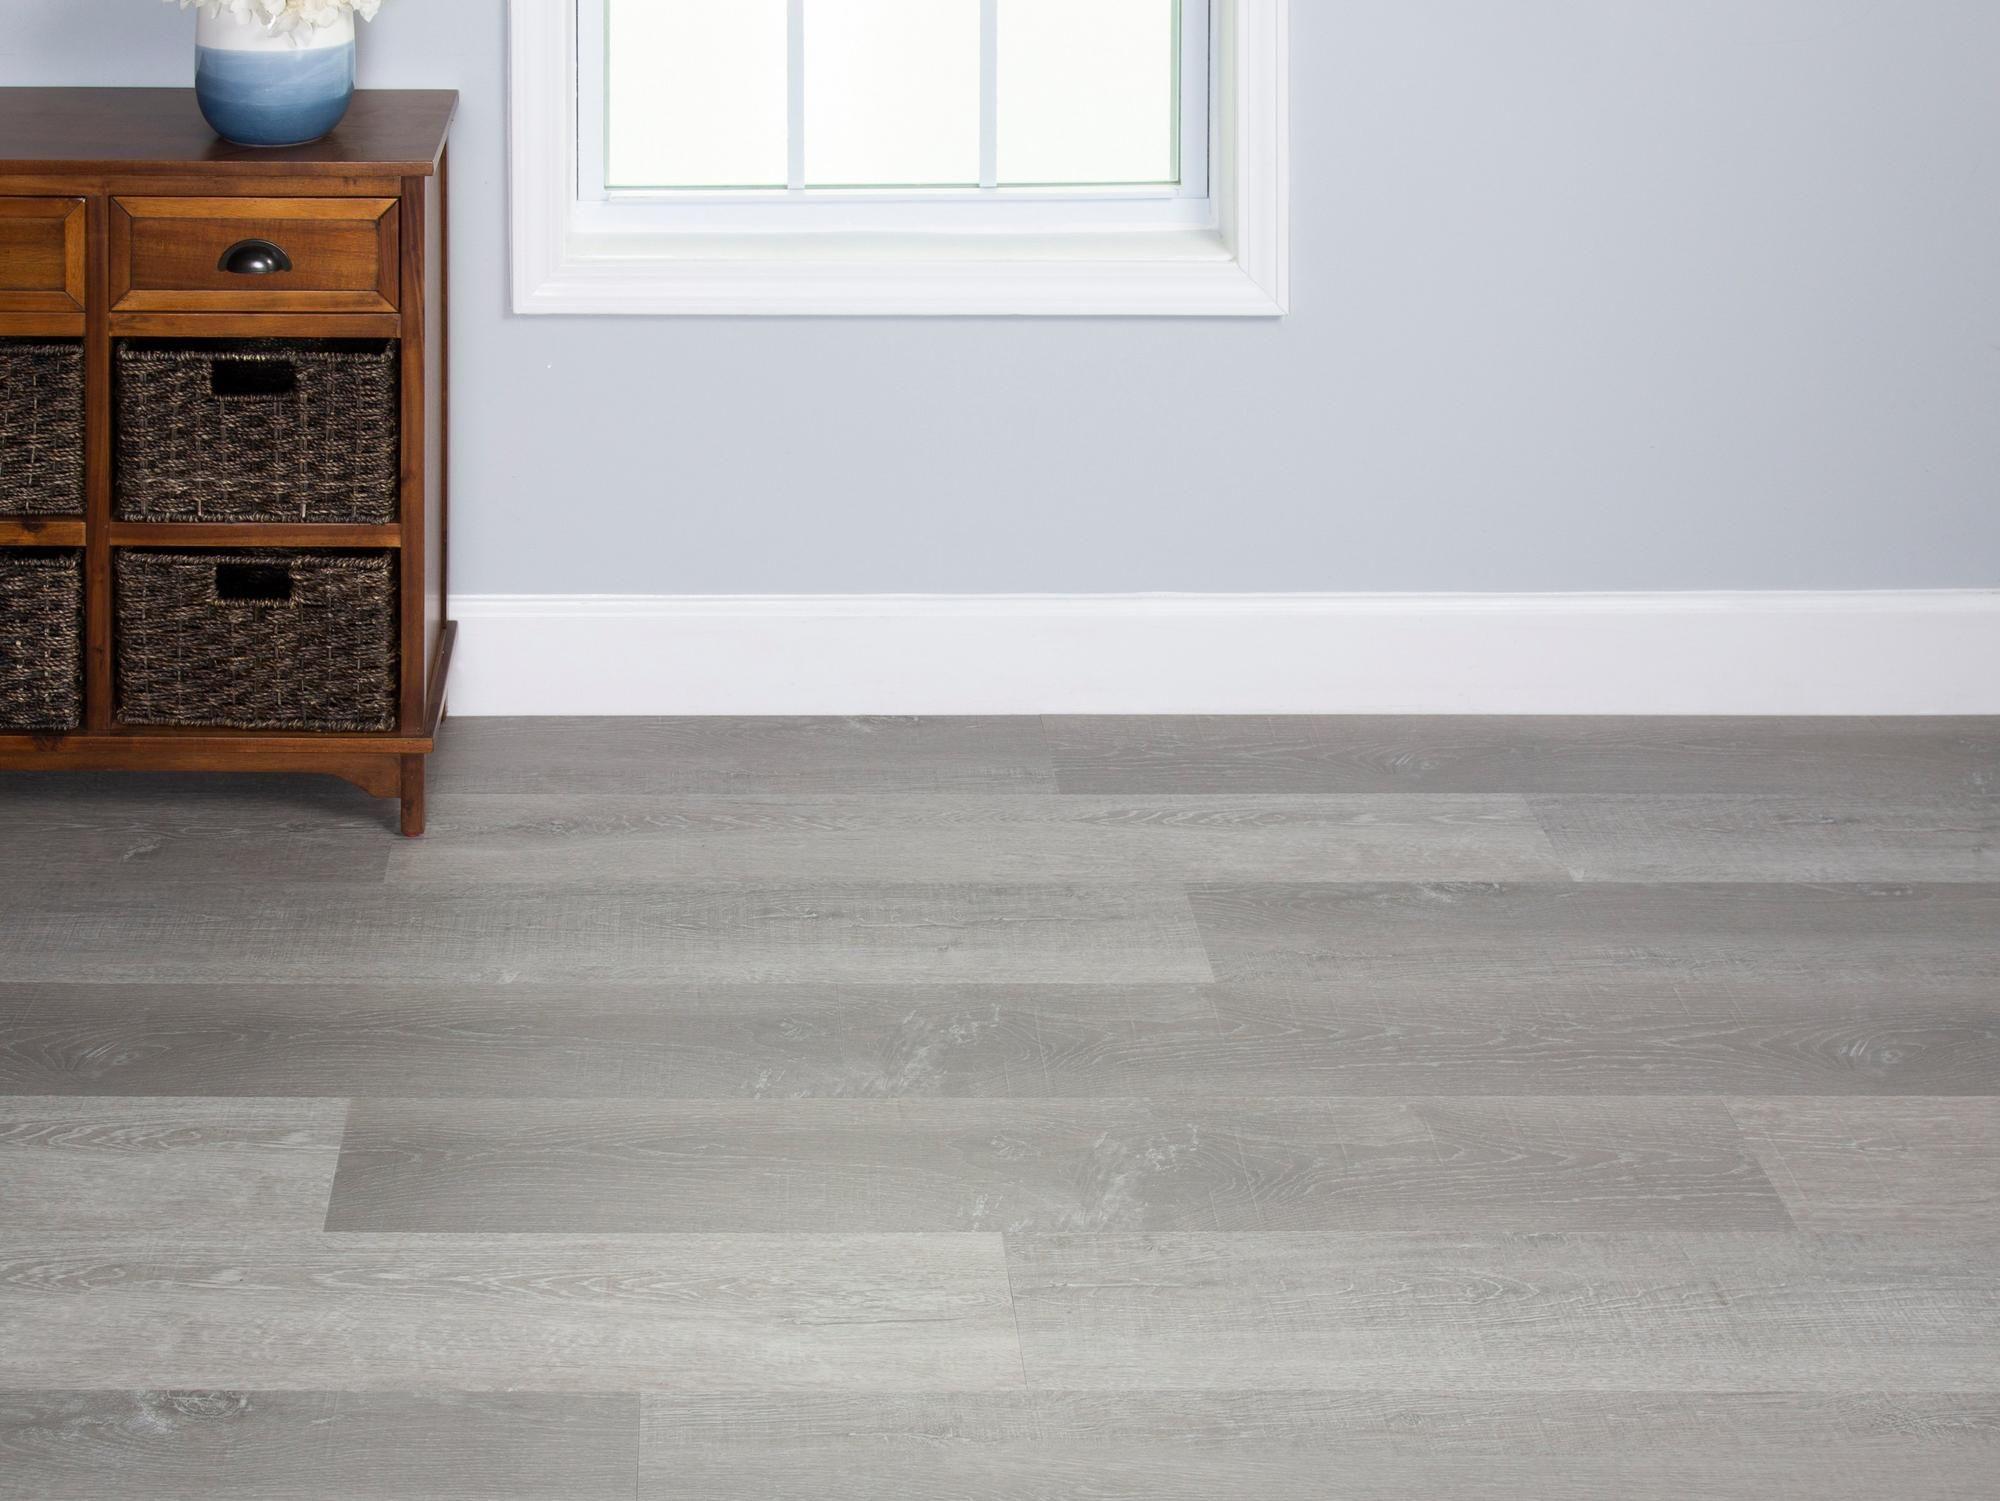 Soft Grey Oak Rigid Core Luxury Vinyl Plank Cork Back In 2020 Grey Vinyl Plank Flooring Grey Flooring Living Room Living Room Wood Floor